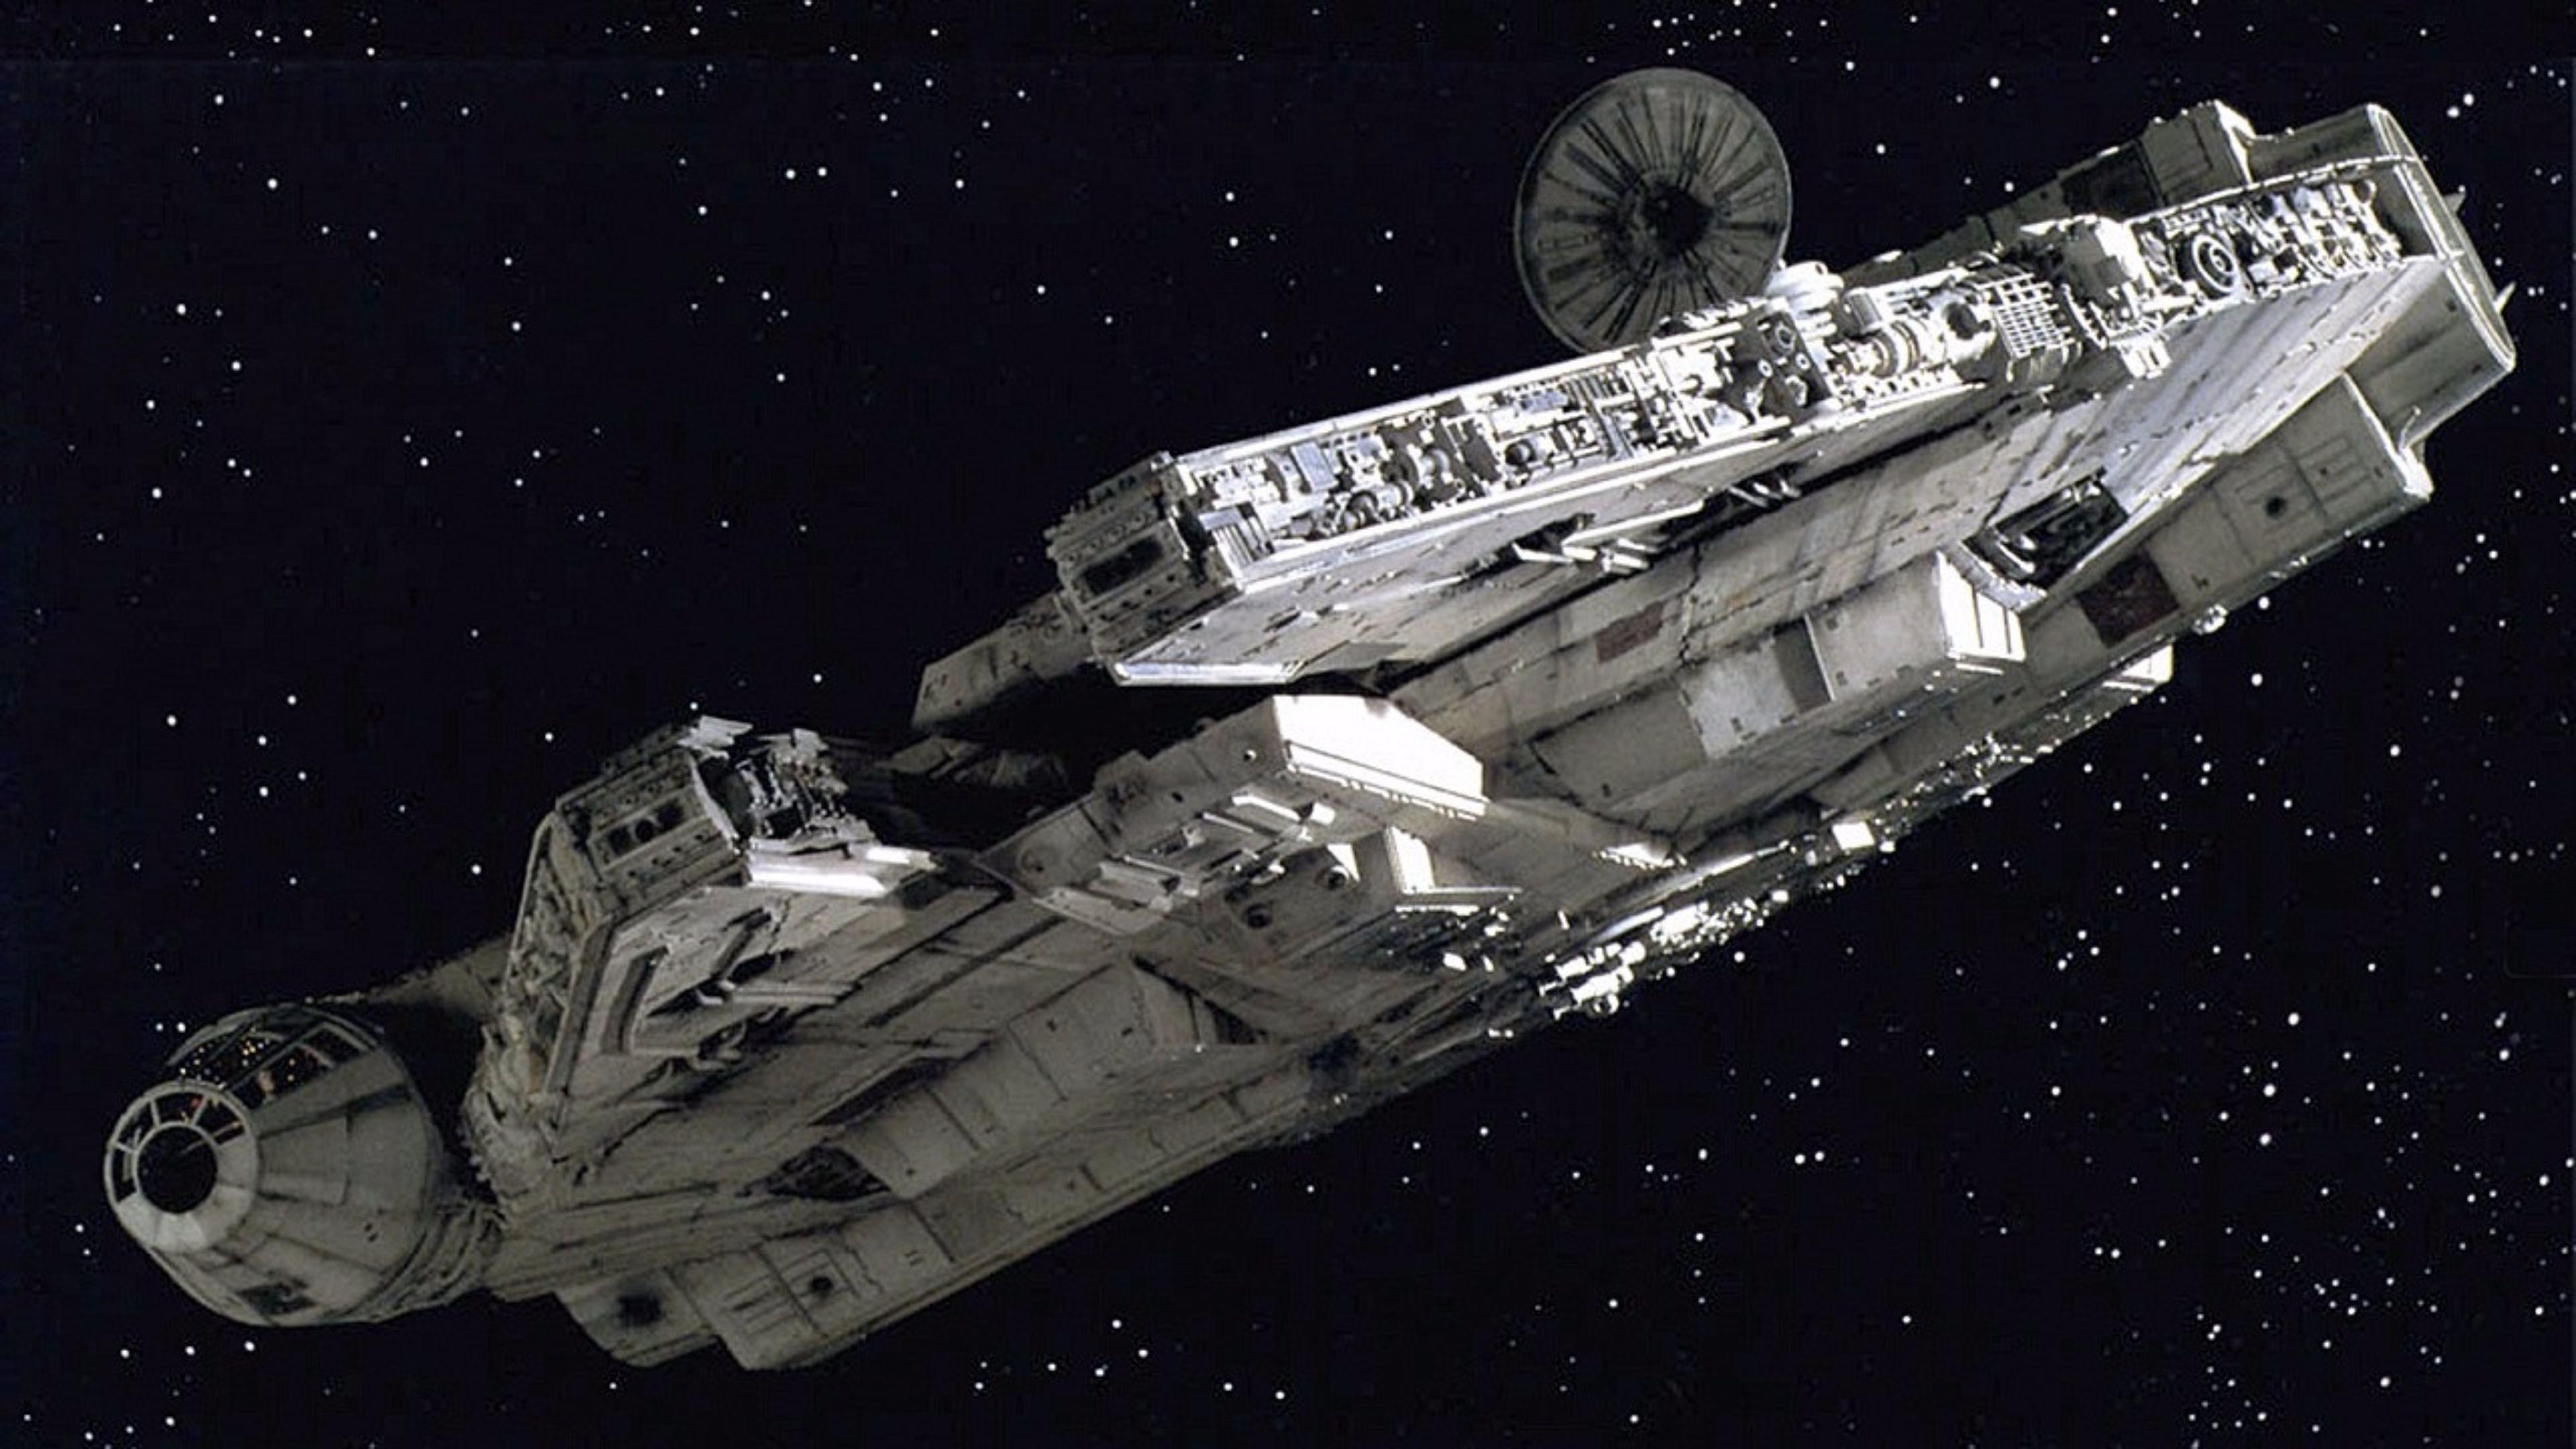 4K Star Wars wallpaper ·① Download free stunning full HD ...